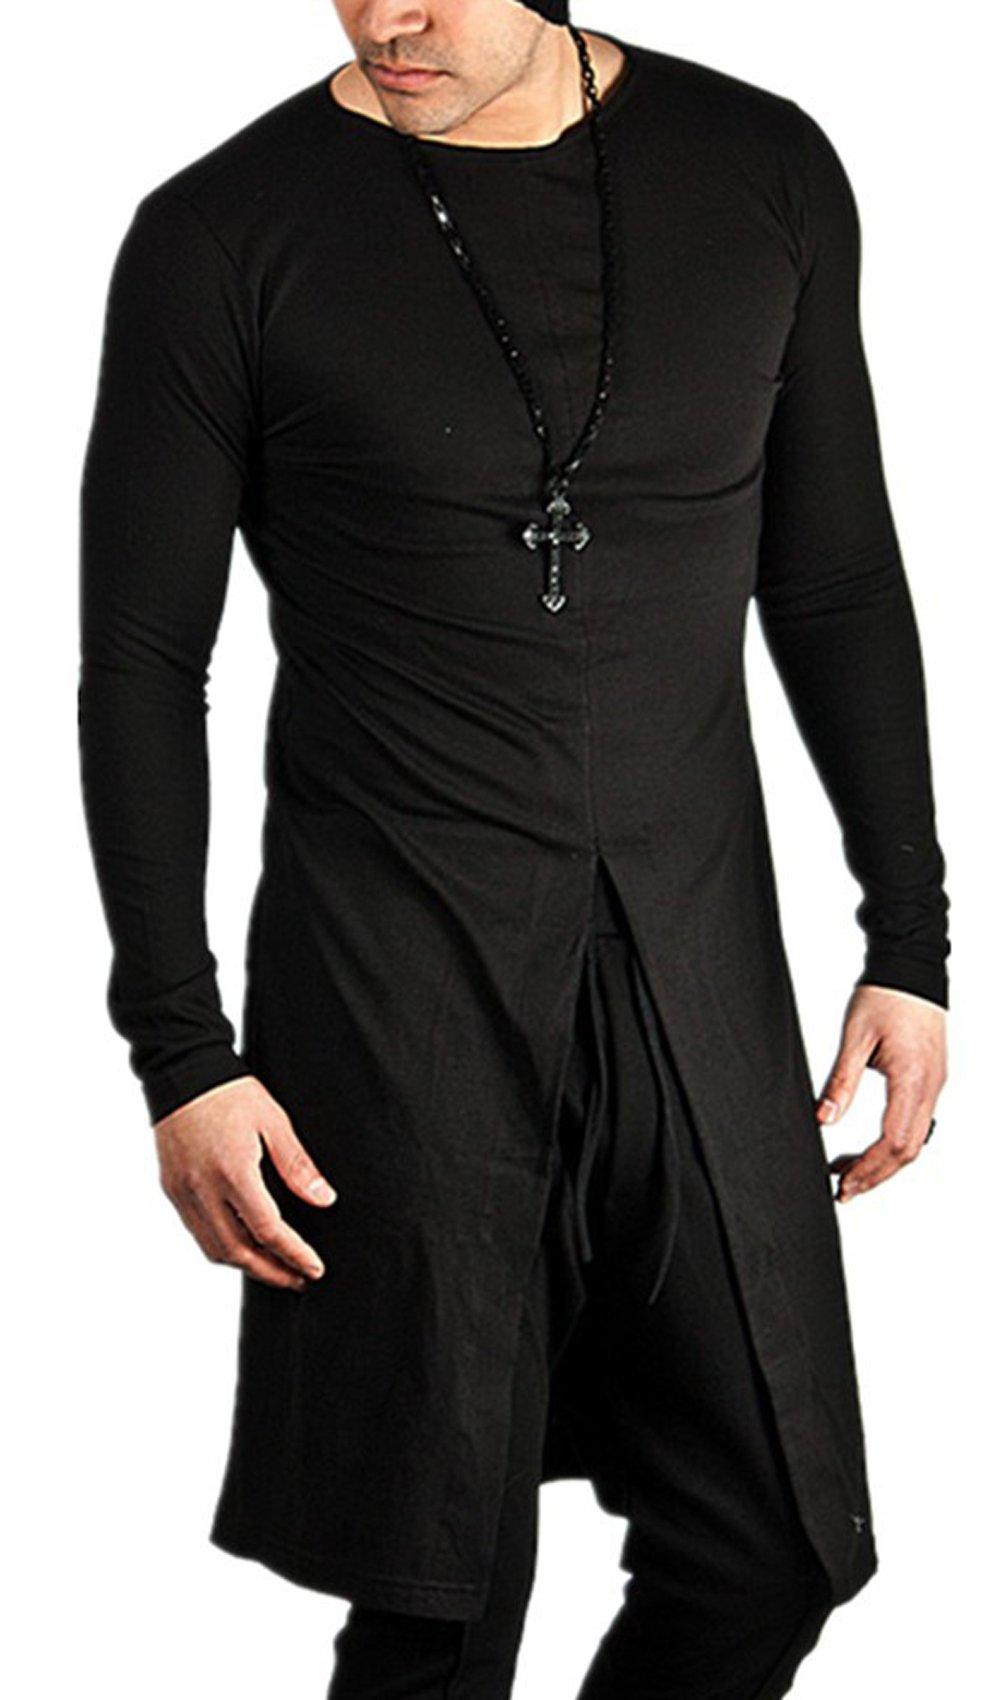 JOKHOO Men's Long Sleeve Slim Fit Long Hem Pullover T-Shirt (Black 1, XL)